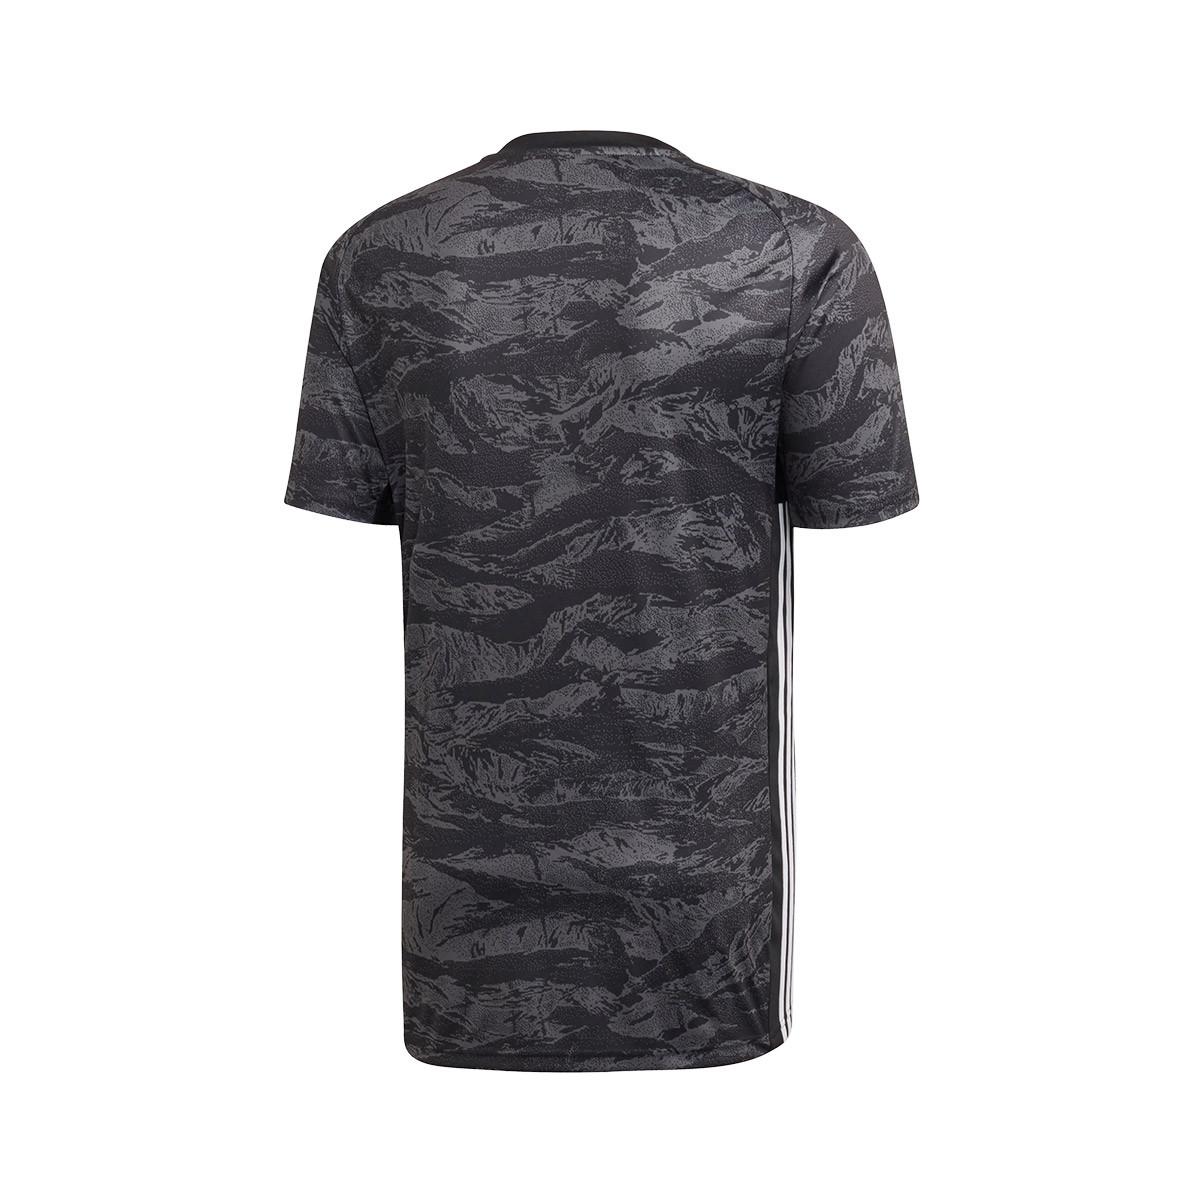 big sale 0a7db 75987 Camiseta Juventus Portero Primera Equipación 2019-2020 Black-White